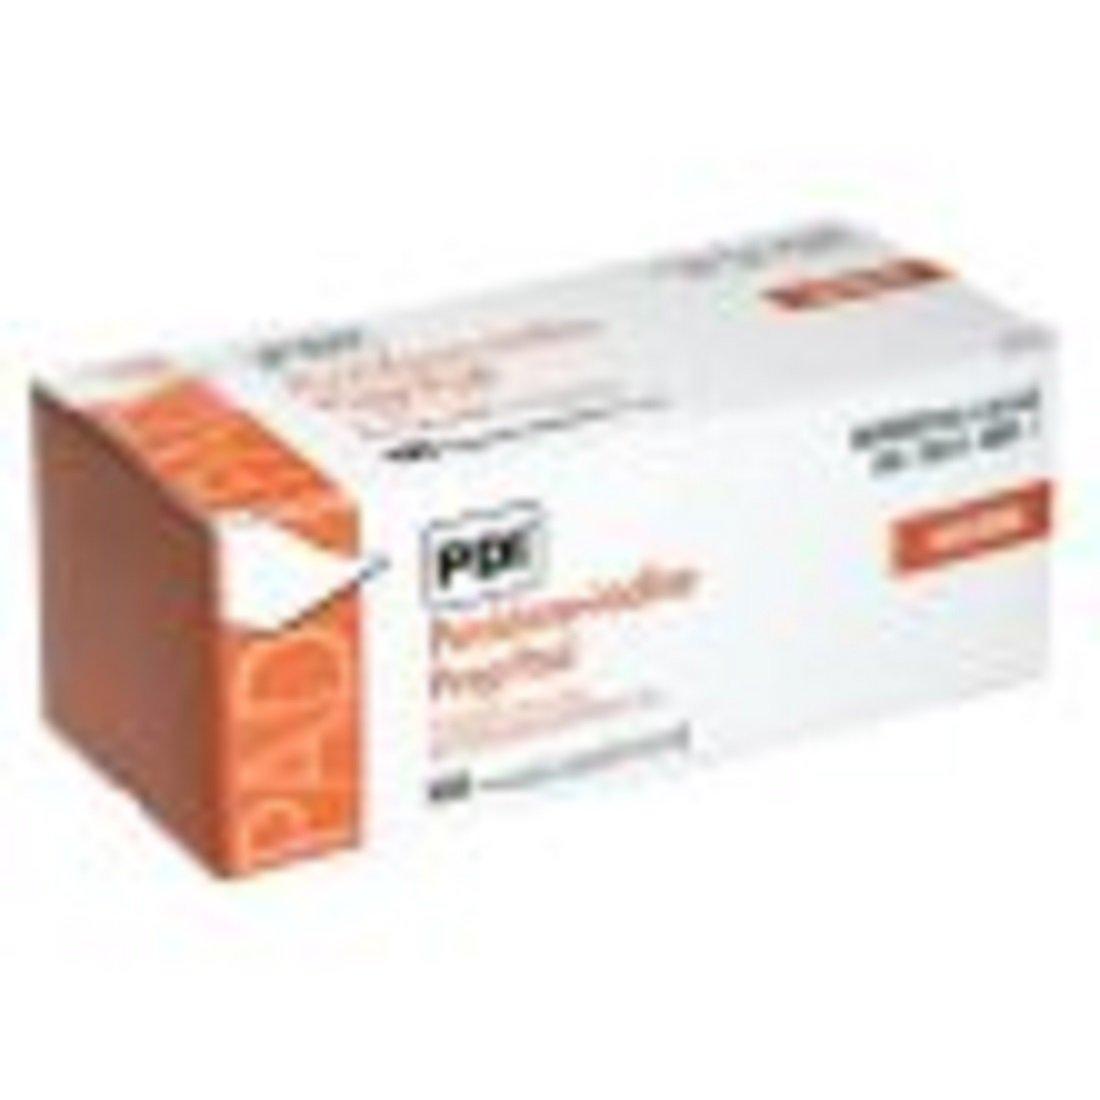 PDI B40600 PVP Iodine Prep Pad, Medium, 100 per Box